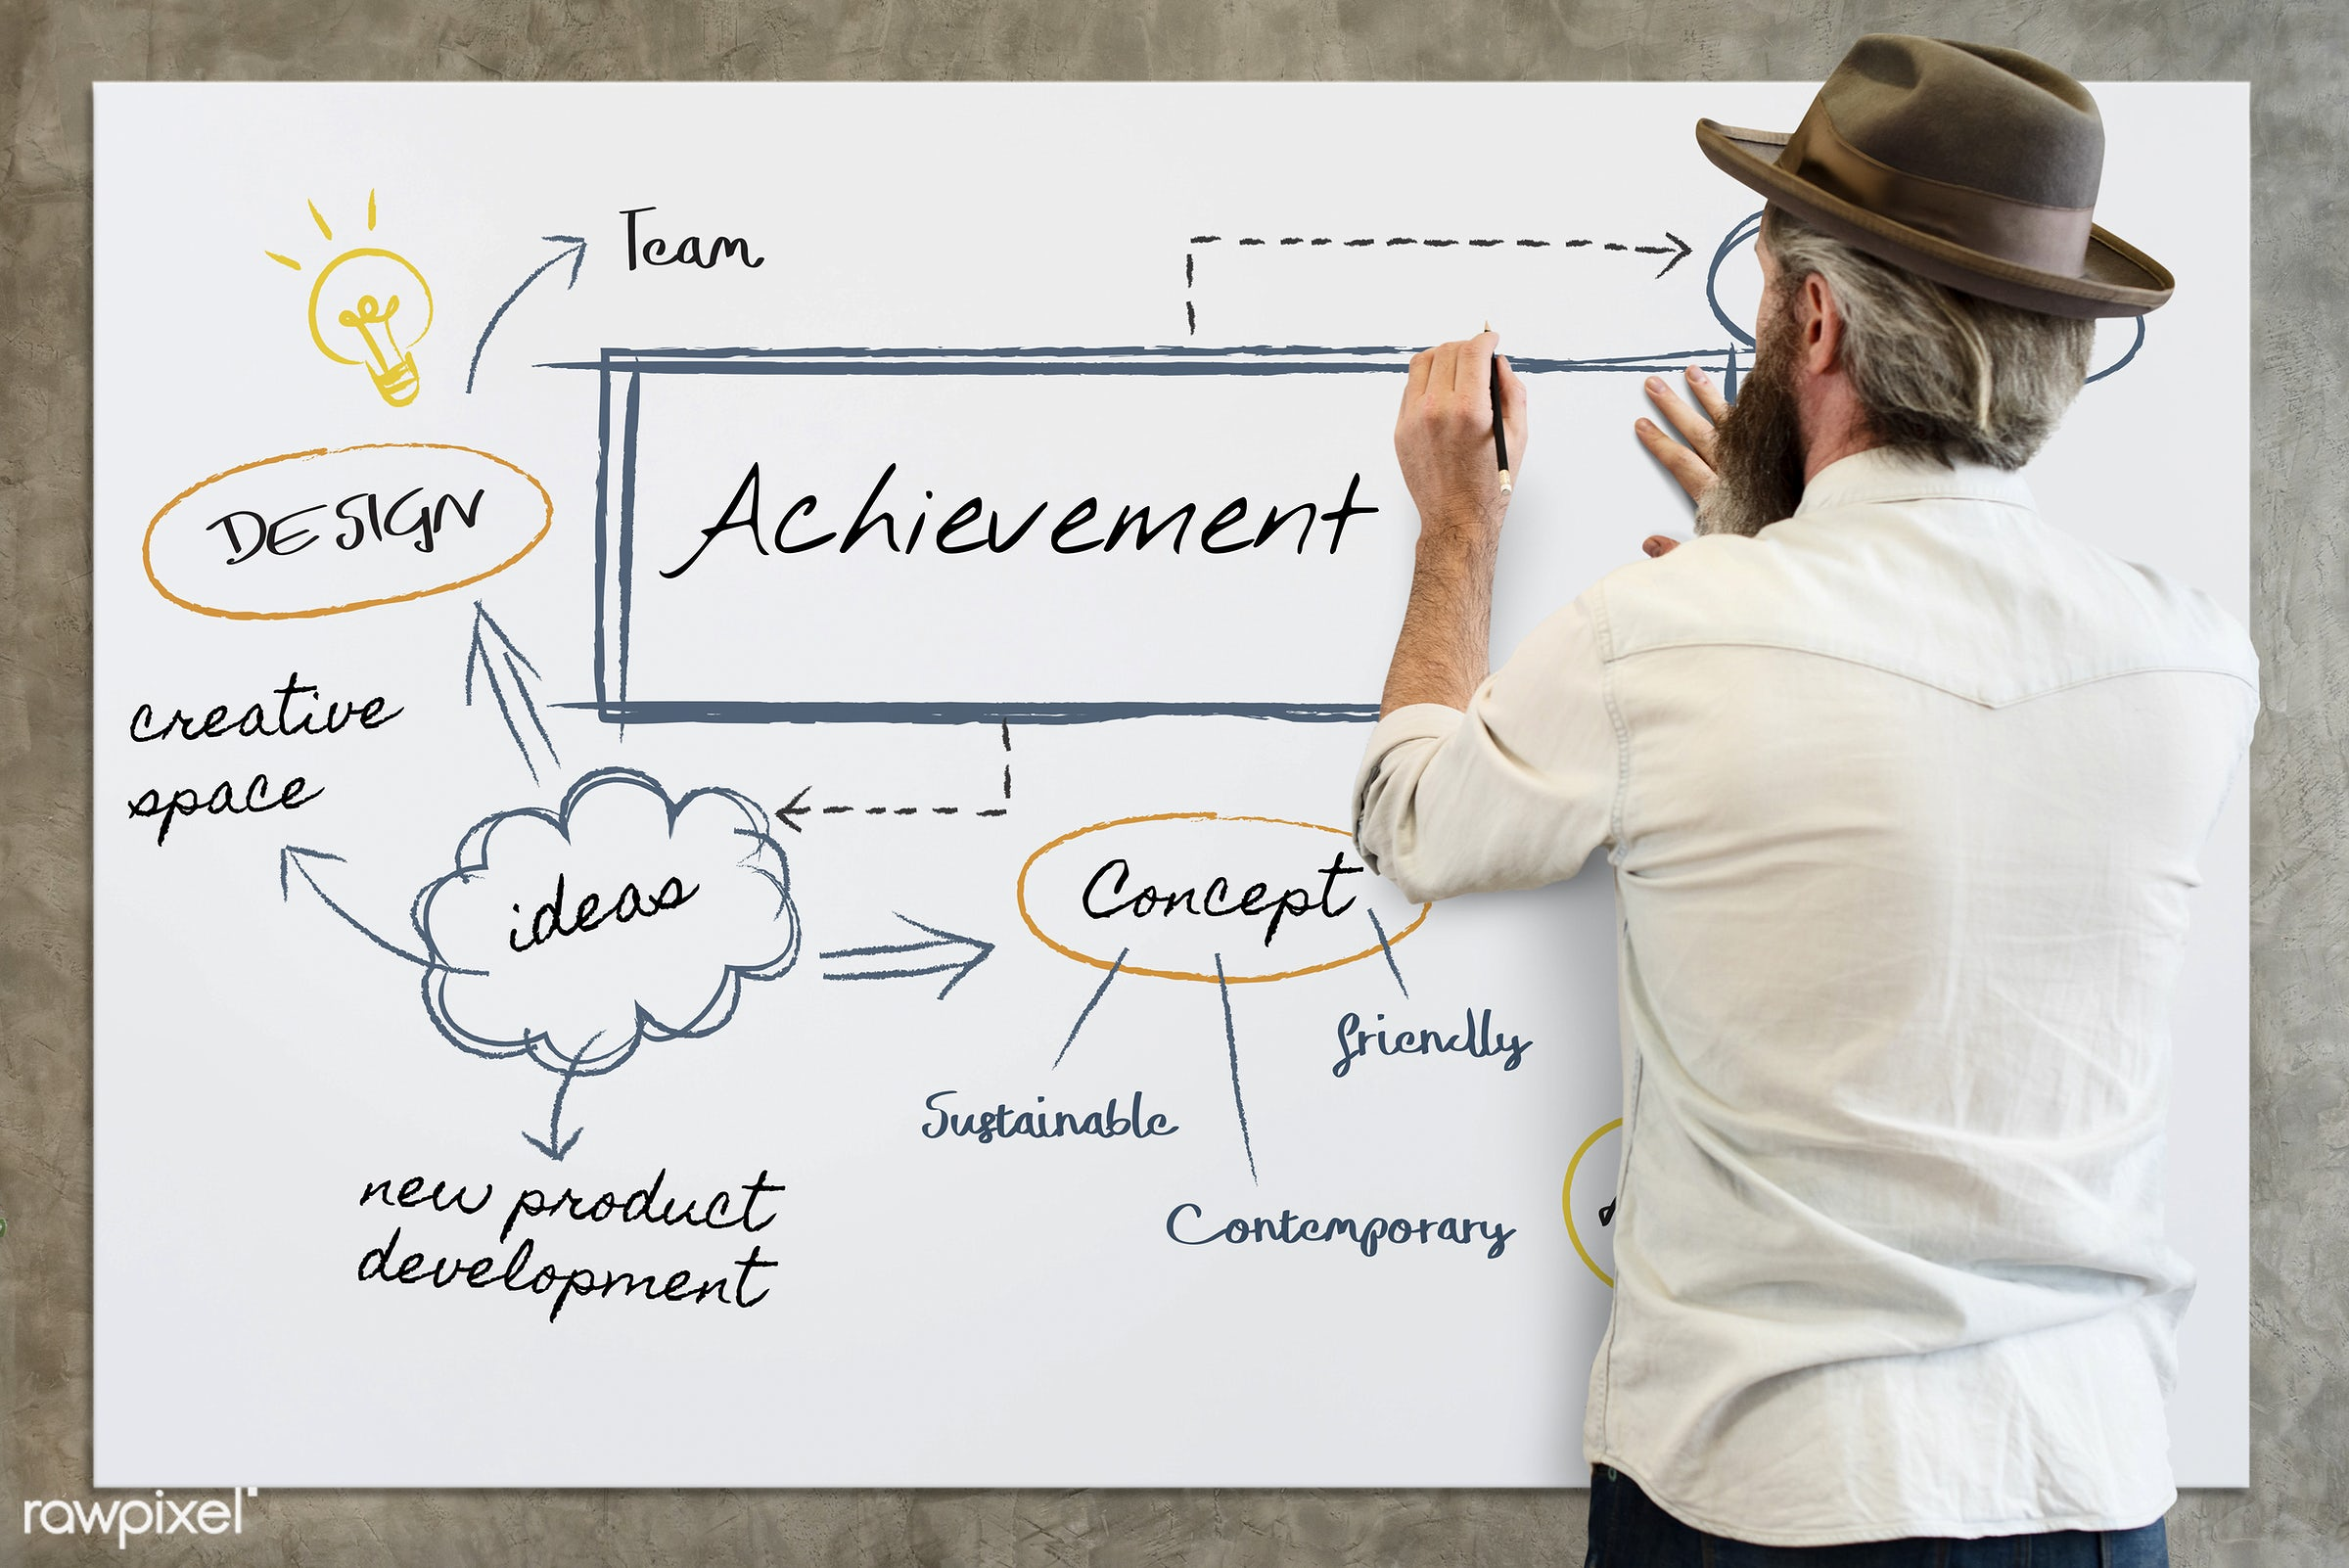 ability, accomplishment, achieve, achievement, adult, alone, back, be creative, beard, beard guy, board, carefree, casual,...